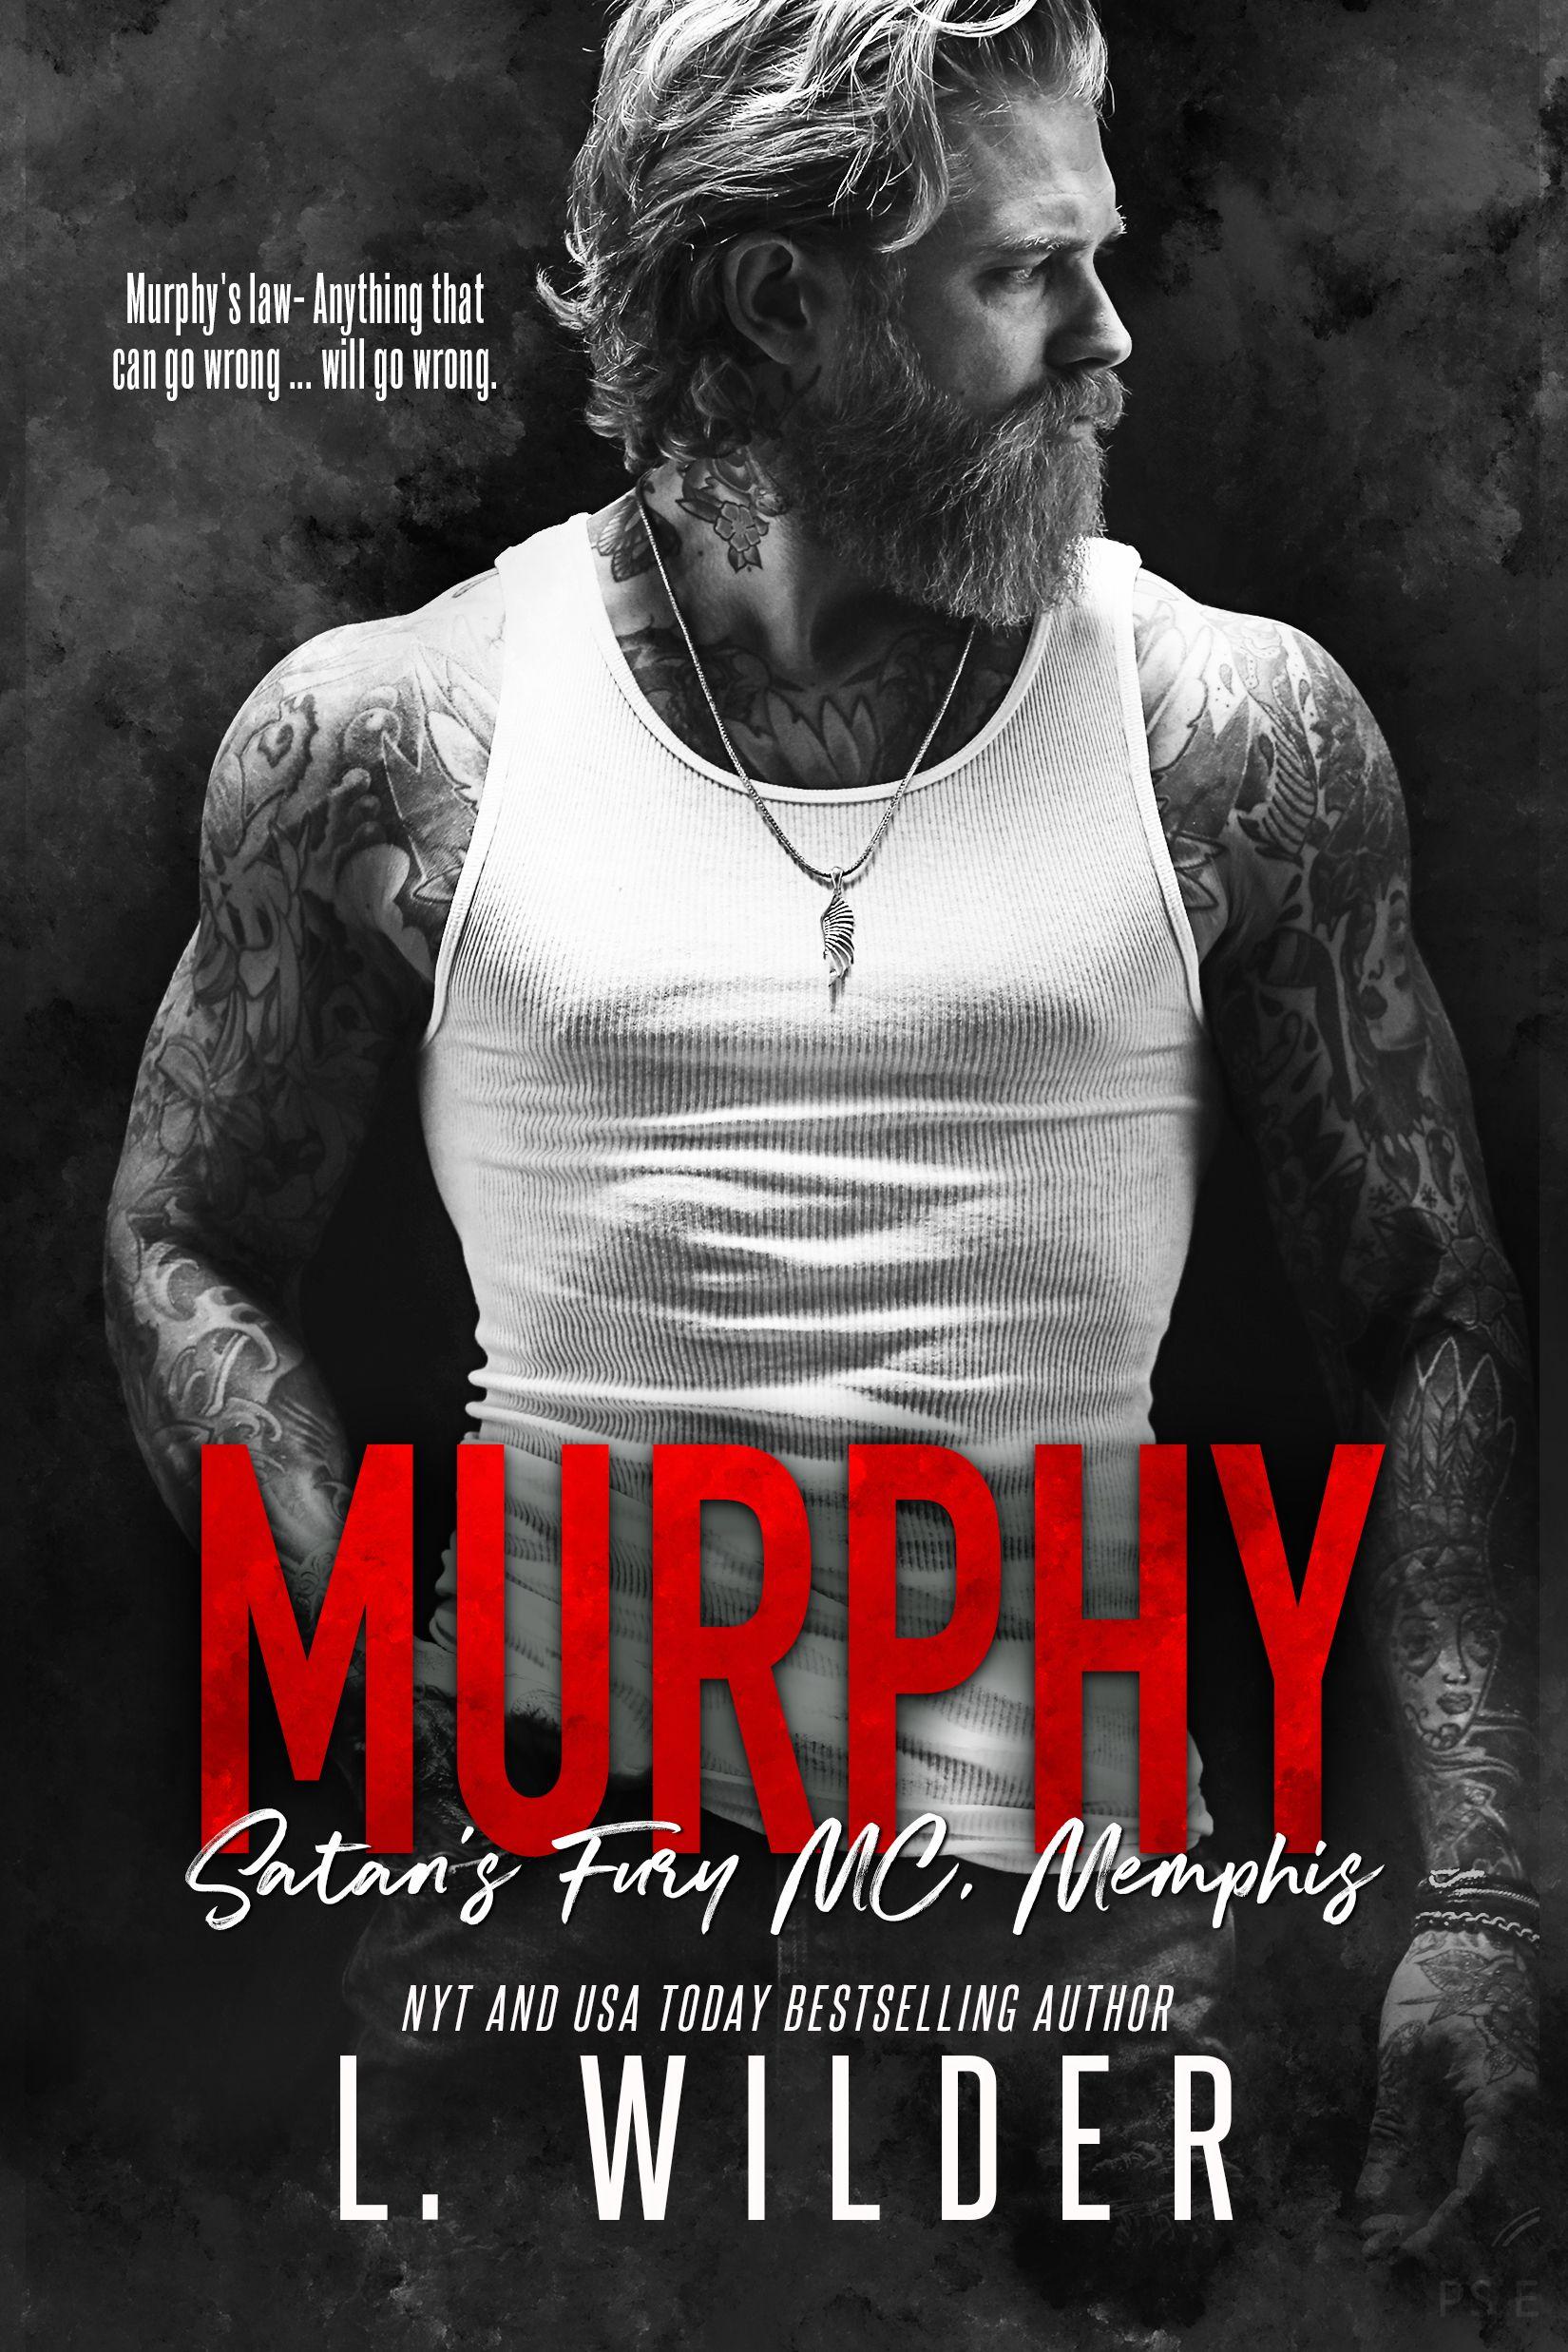 Murphy Satan S Fury Mc Memphis Chapter By Wilder Leslie Is Live Ku 99pennies Amazon Us Https Amzn To 2tdll8k Fury Josh Mario John Books To Read